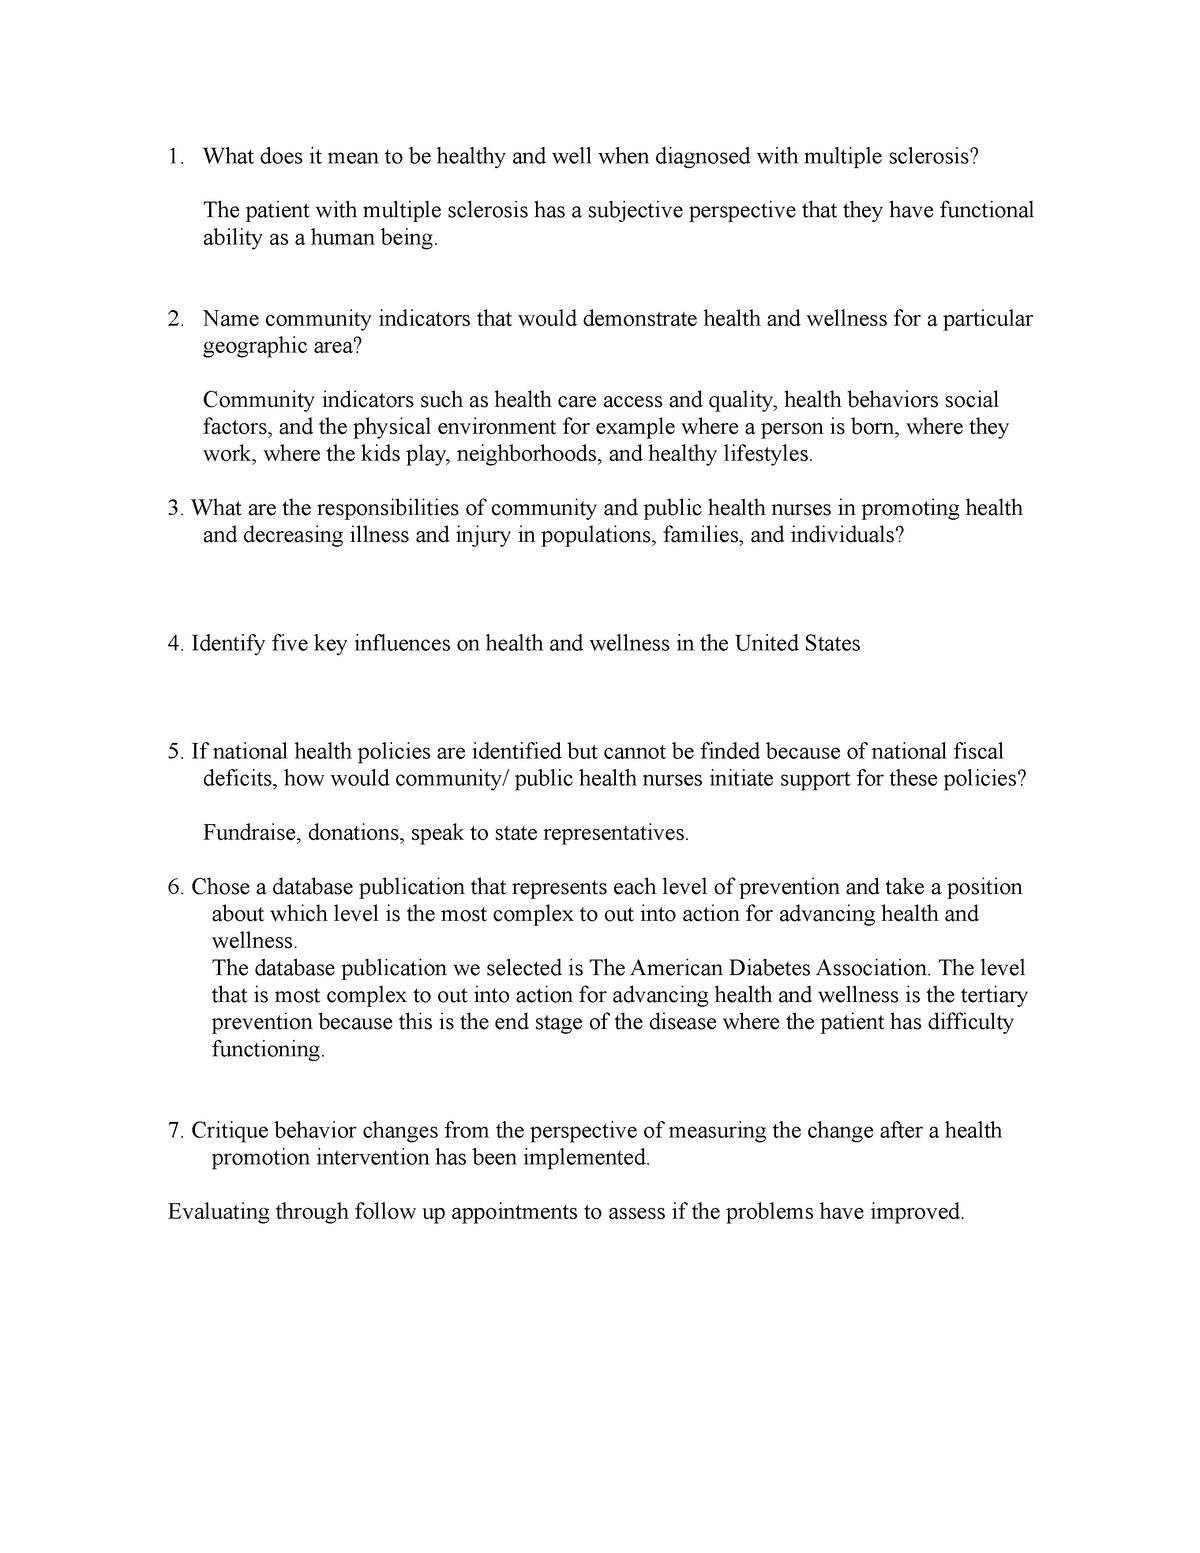 Community questions ch 5 - NUR 4040: Community Nursing - StuDocu